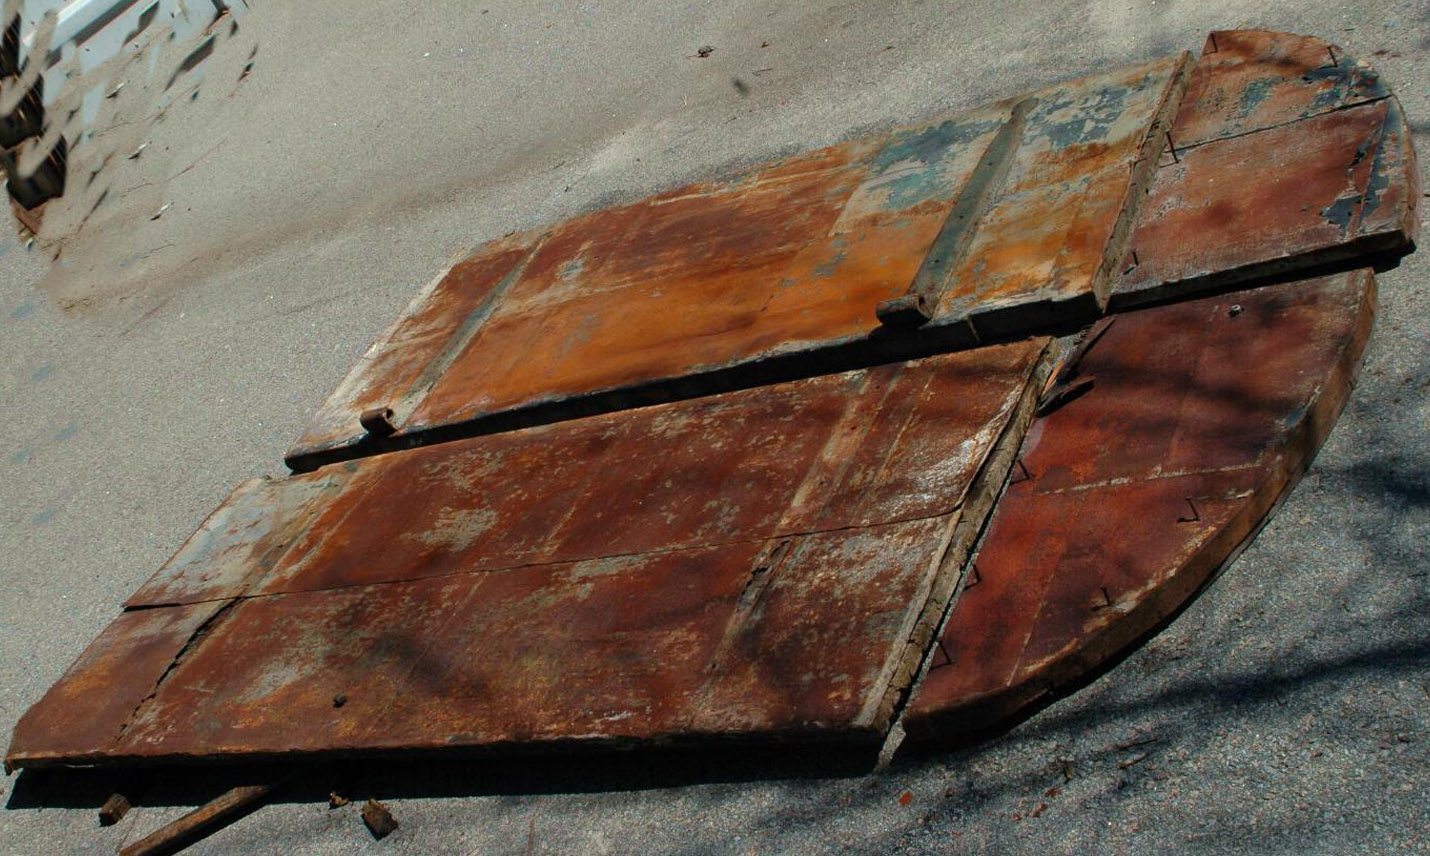 Antique Iron Savannah Shutter Doors Architectural Old Industrial Hurricane Rare